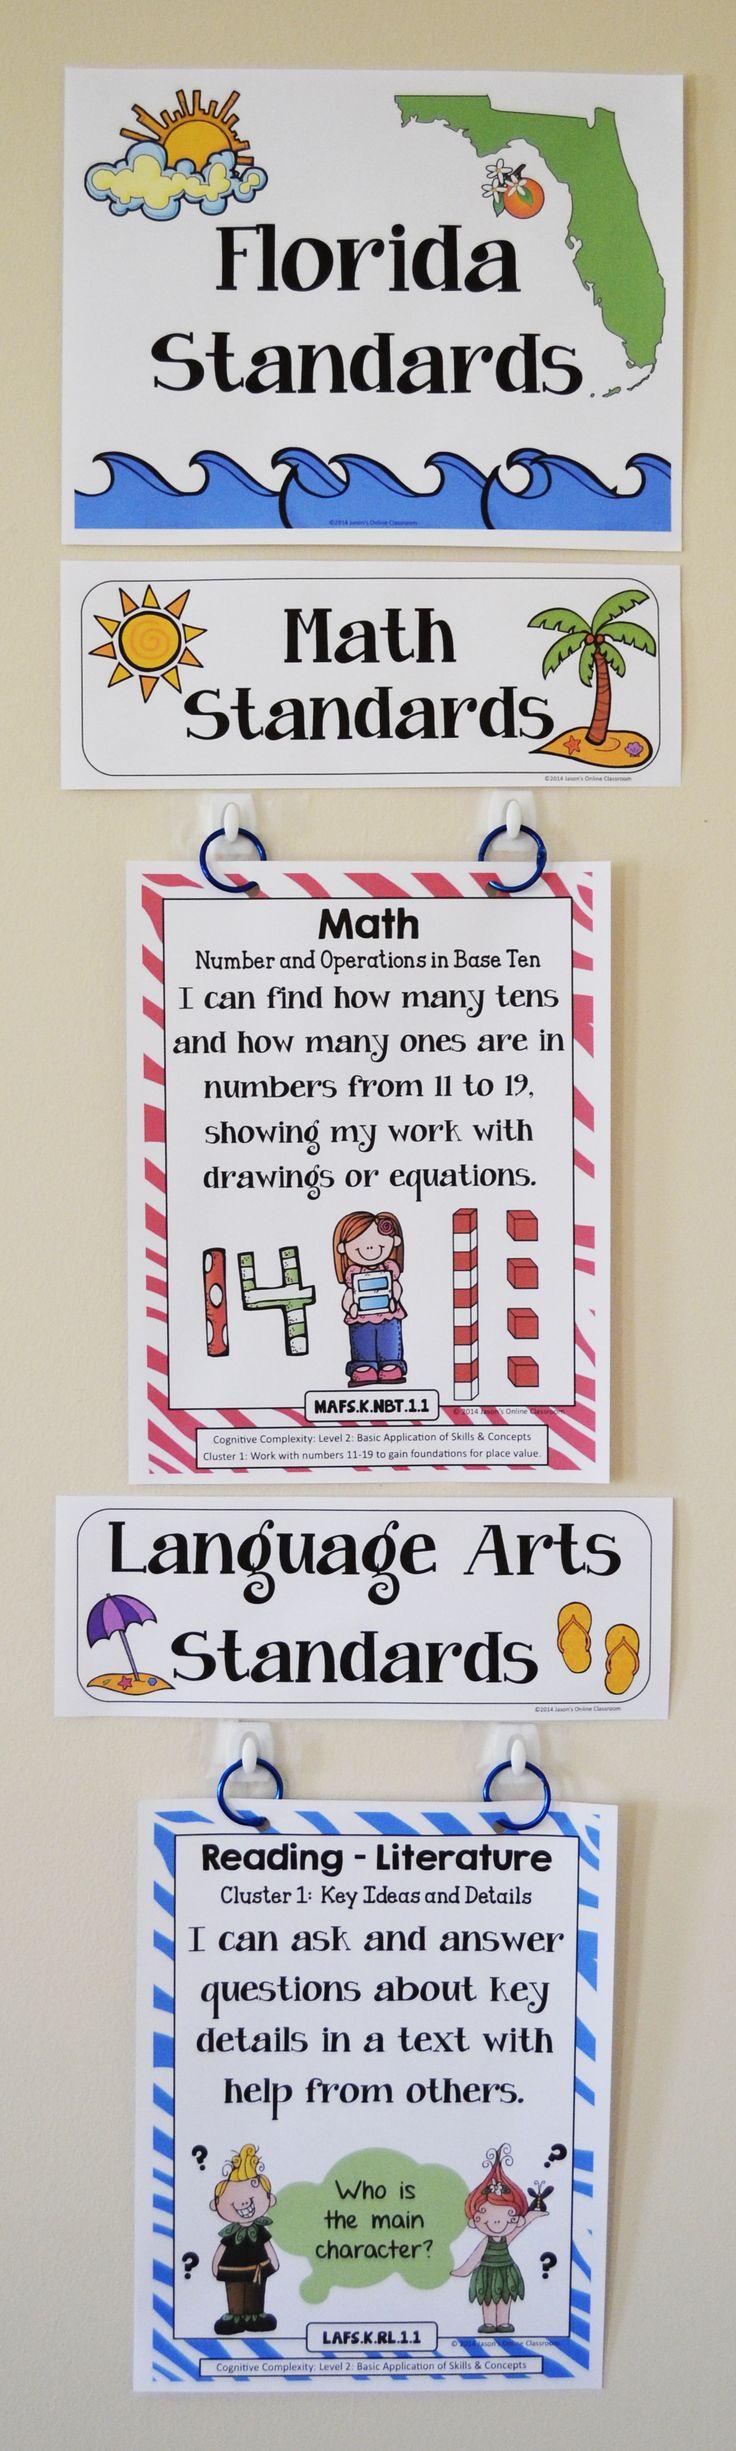 Florida Standards for Kindergarten! $  Cool way to display standards...